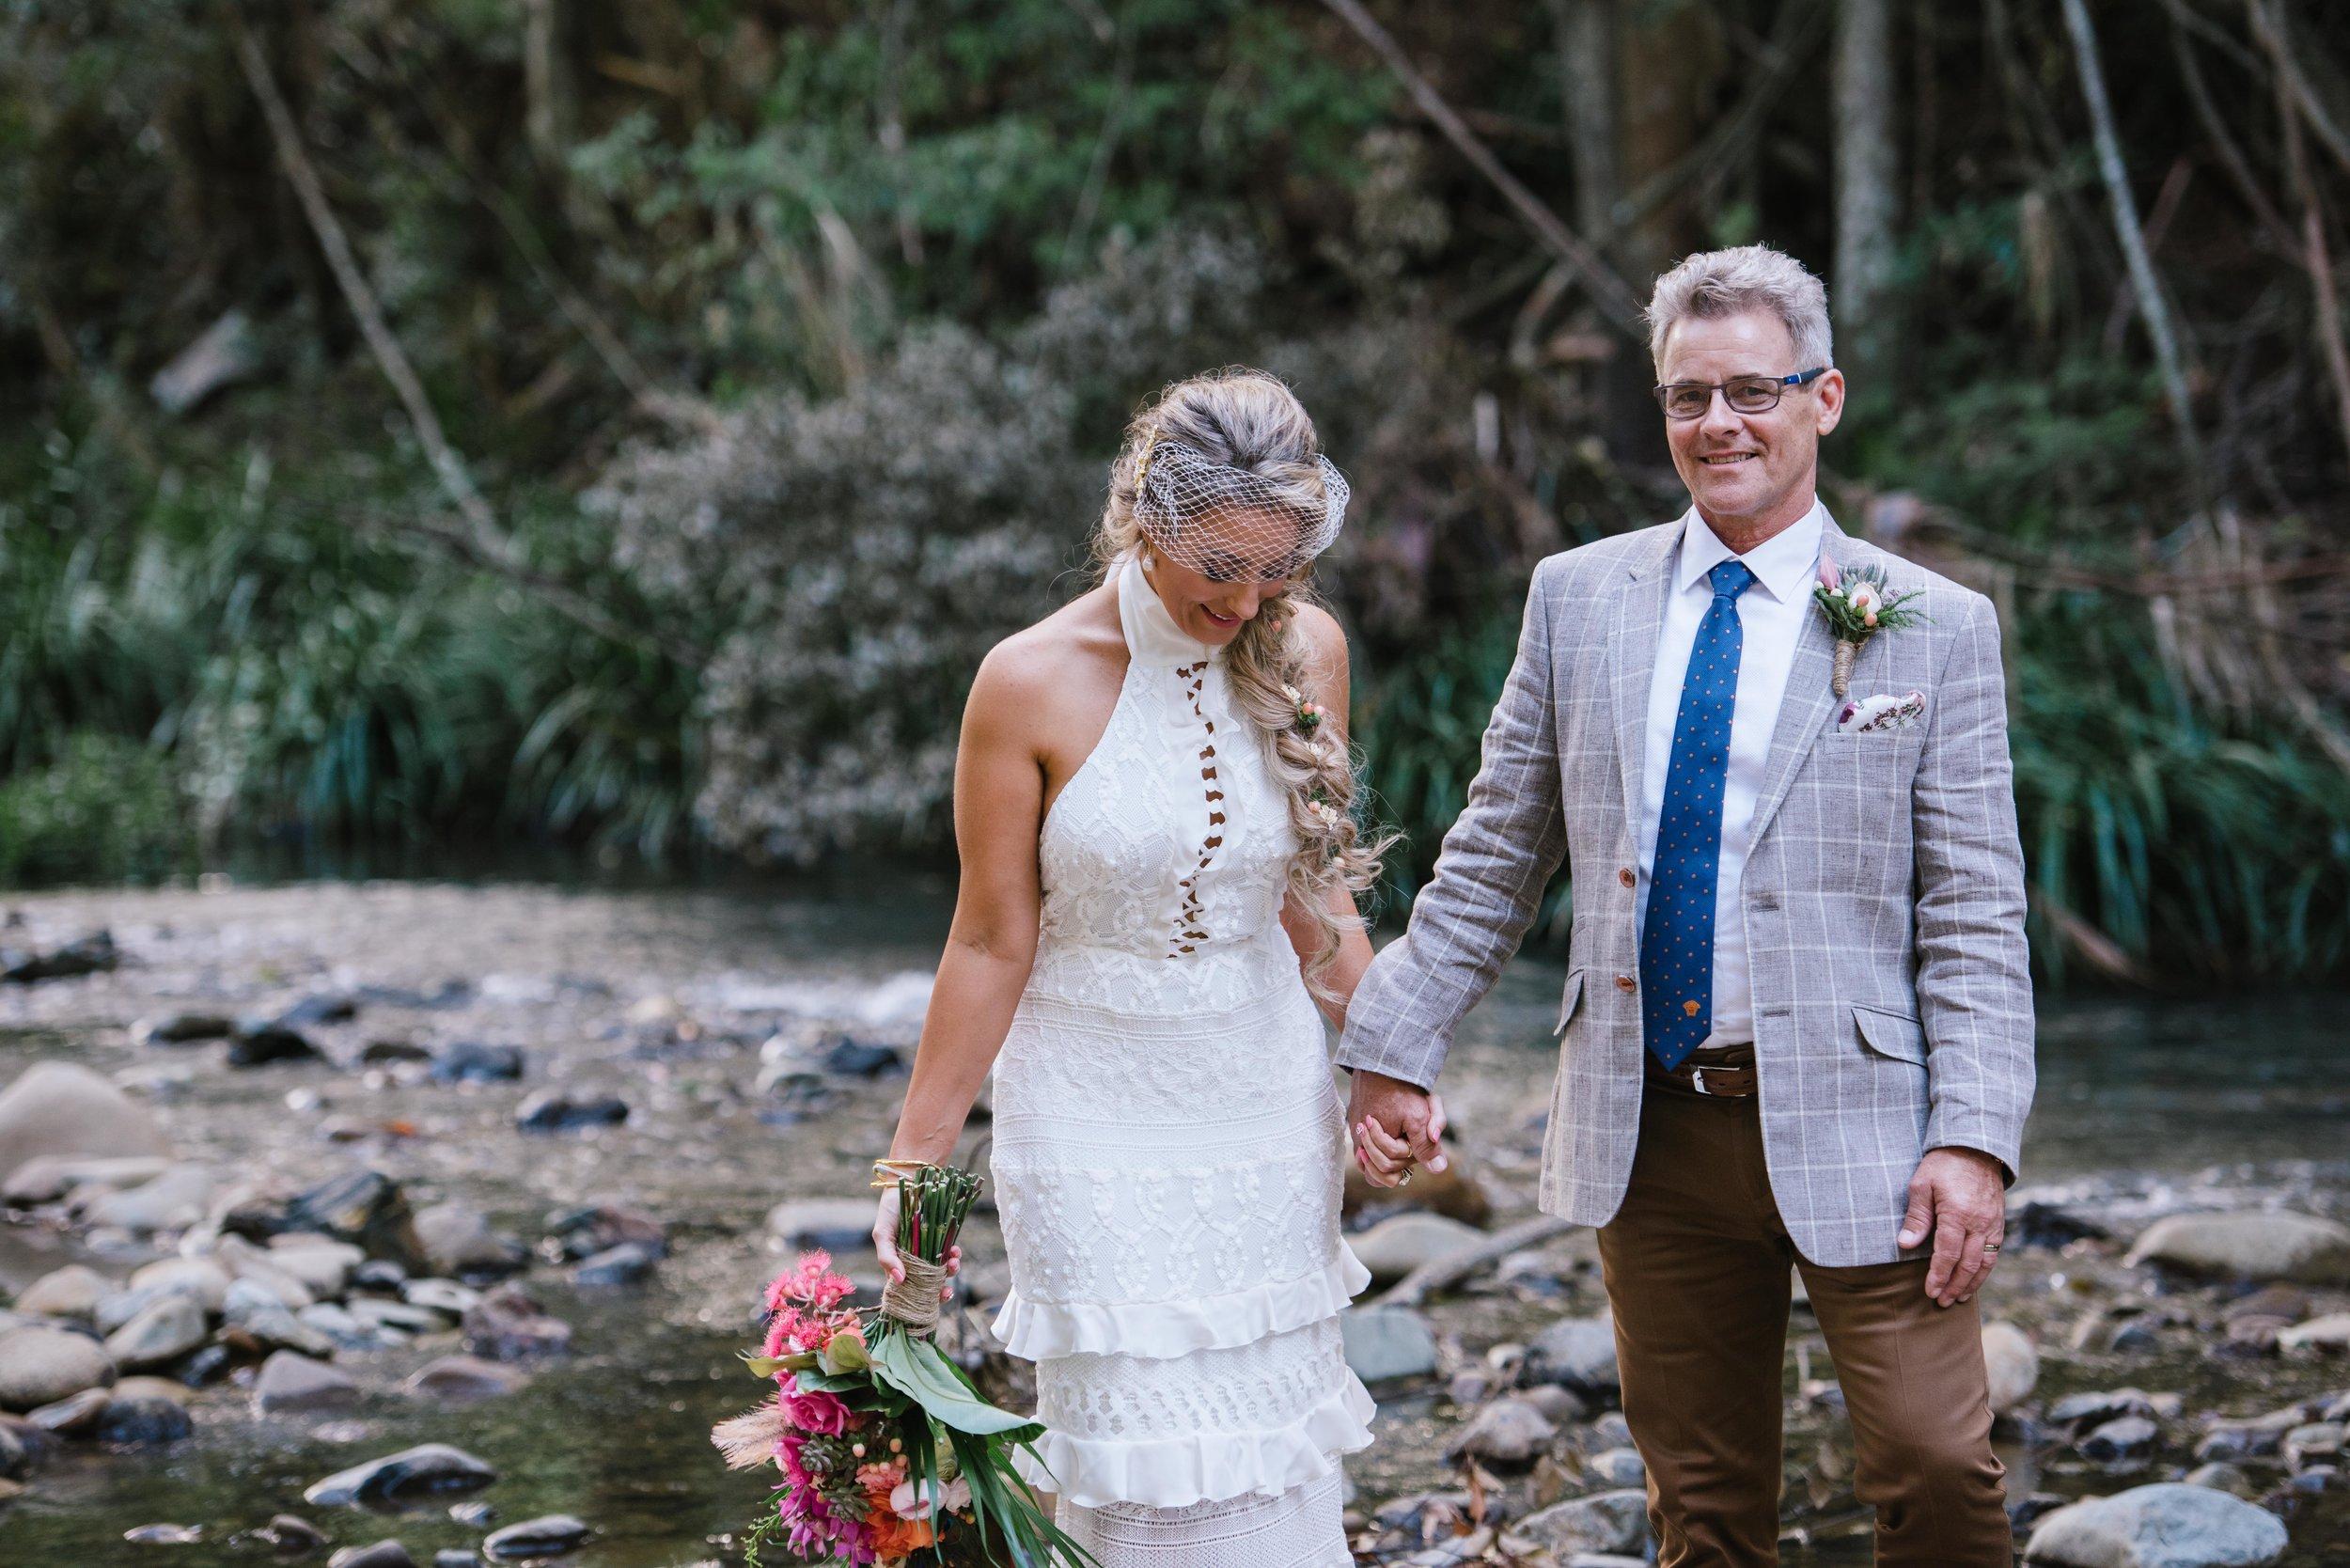 leah and cliff- skyla sage photography   wedding photographer, byron bay wedding and family photographer, tweed heads wedding and family photography-140.jpg